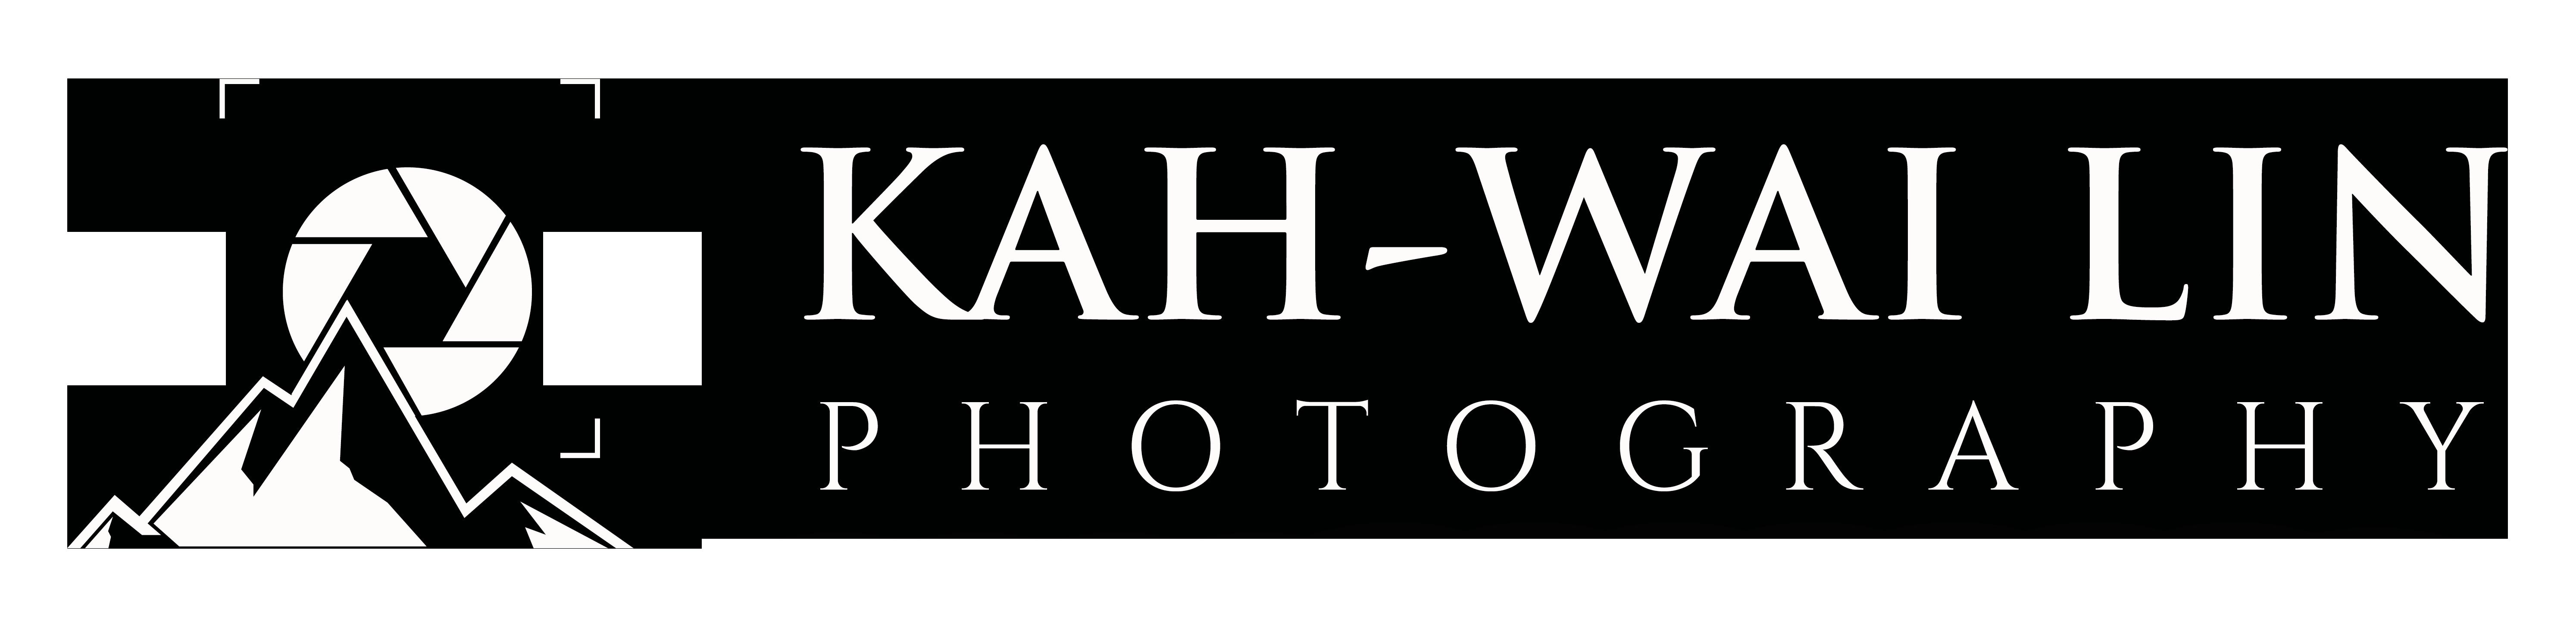 Kah-Wai Lin Photography